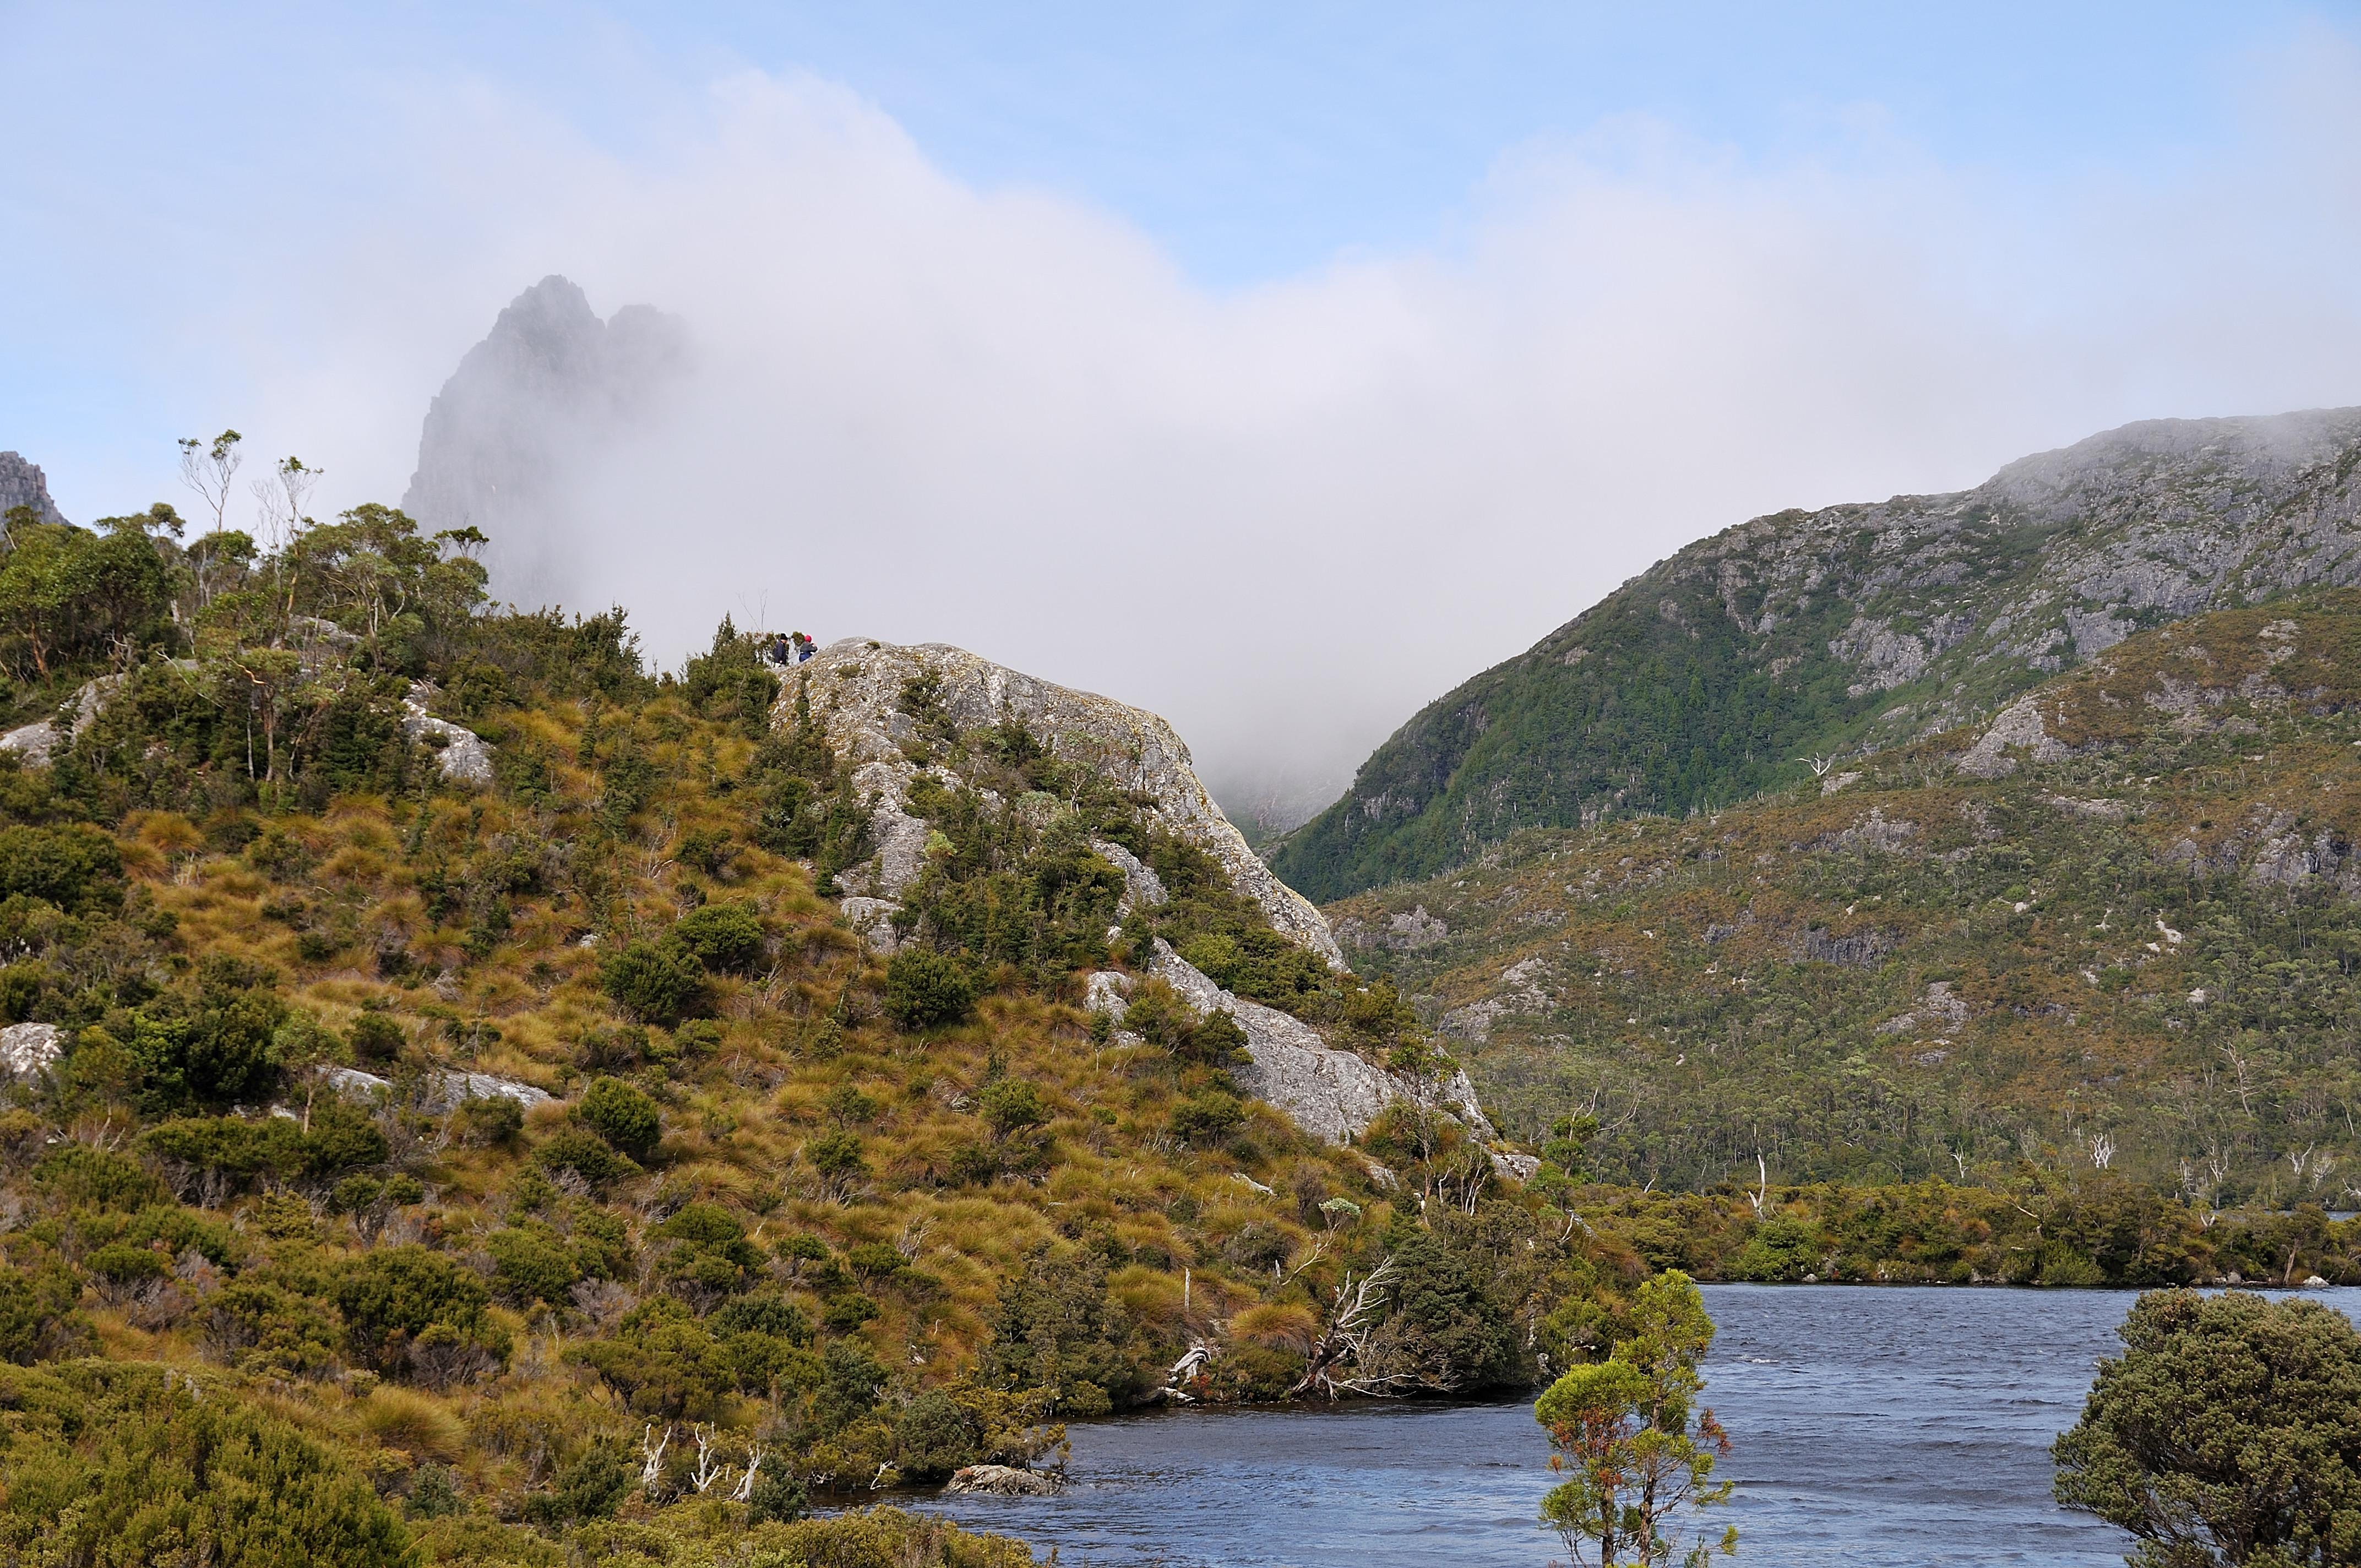 Hiking in Australia: 10 great hikes Down Under | CNN Travel